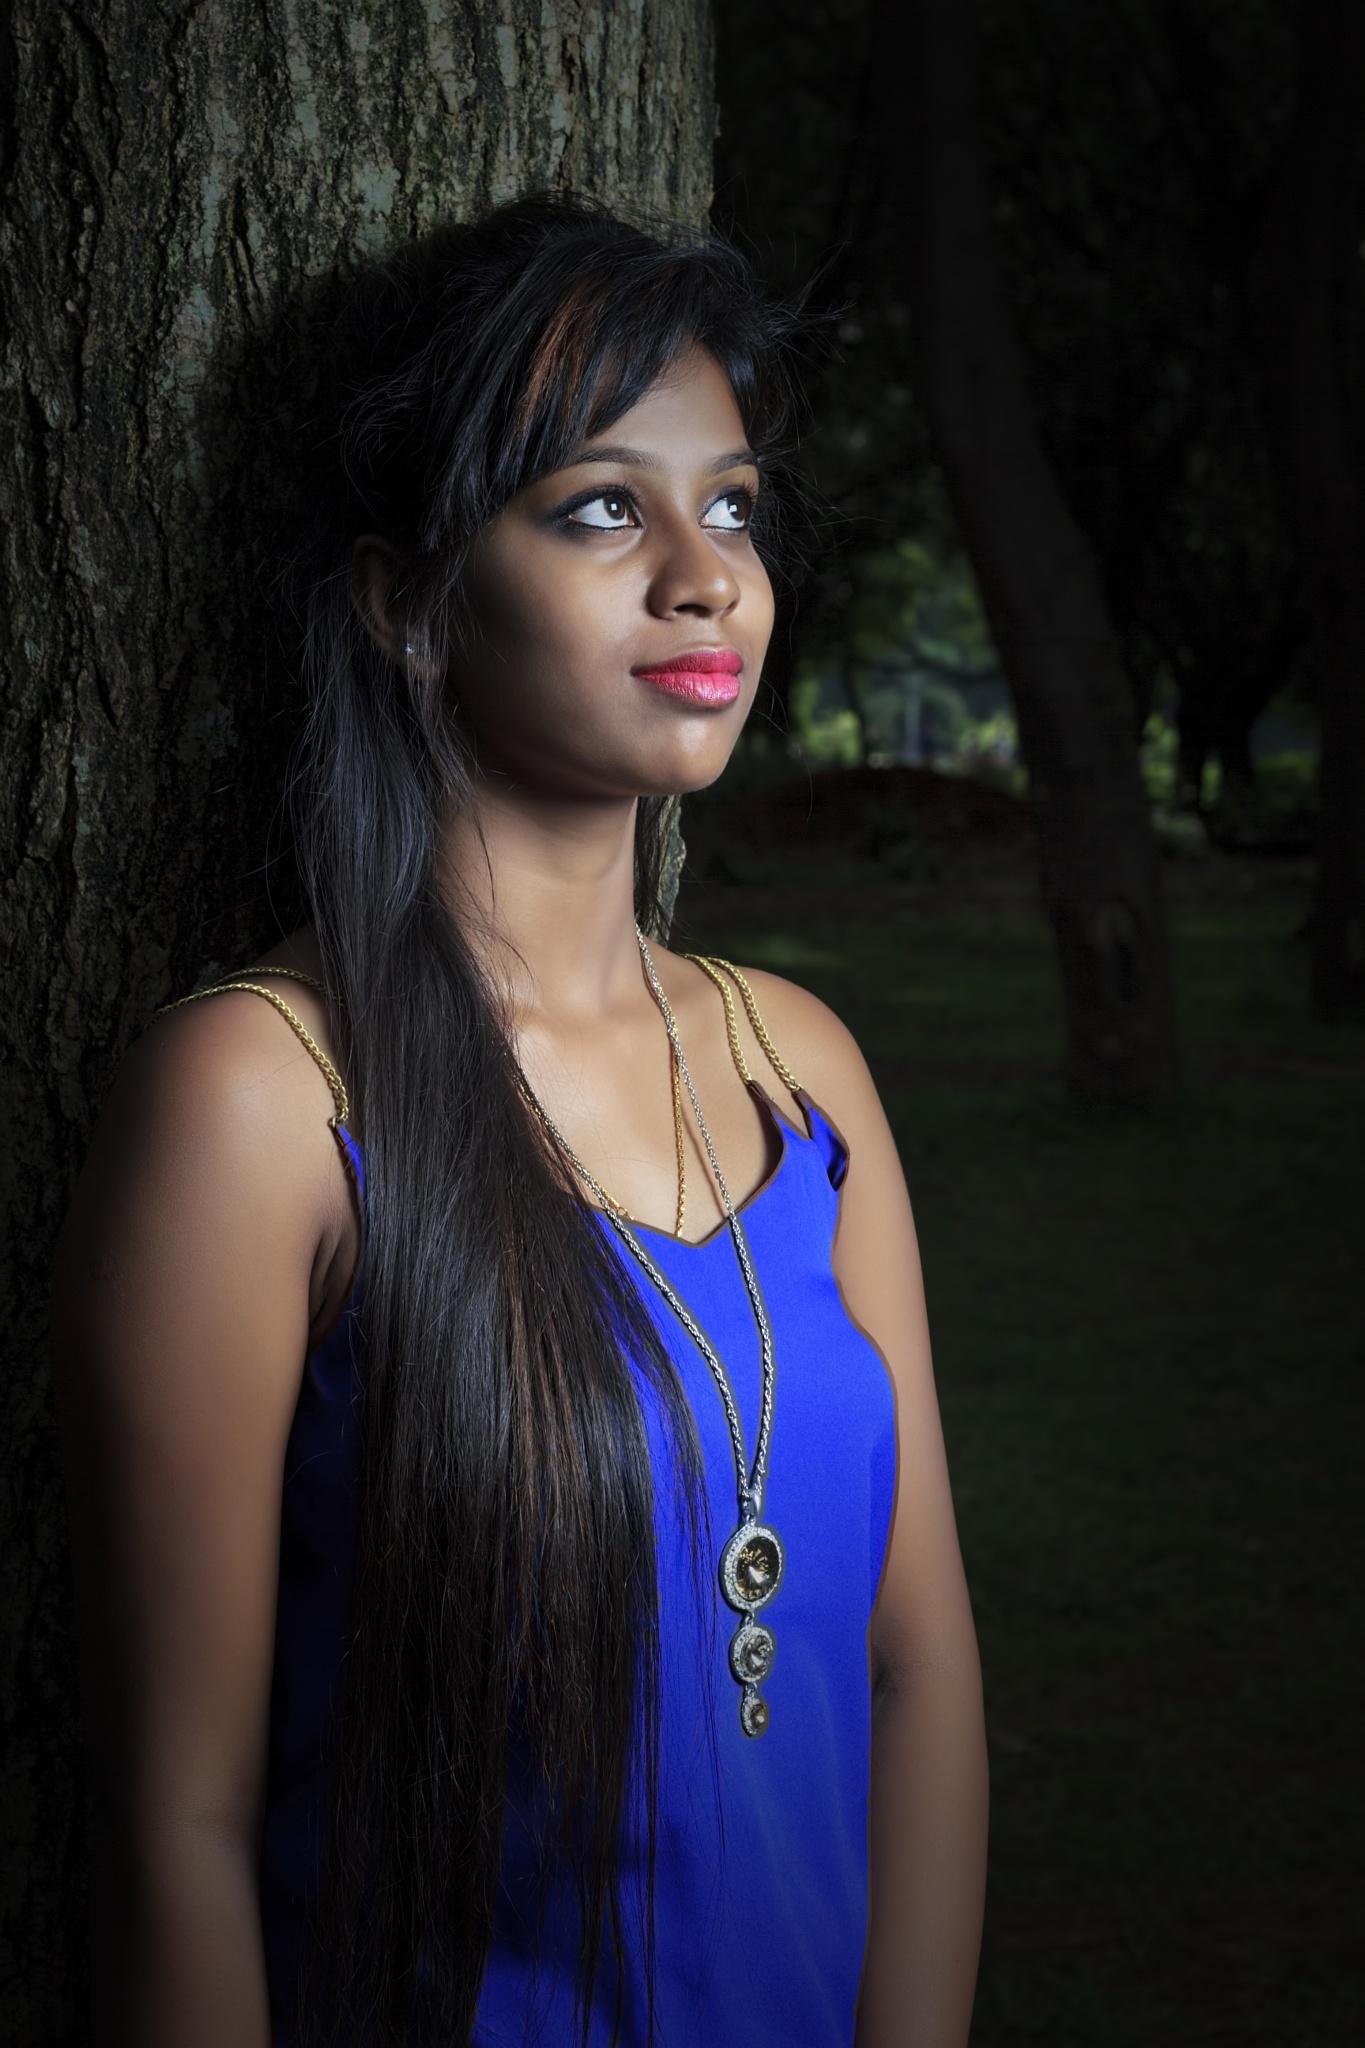 Intent look by Prem Swarup